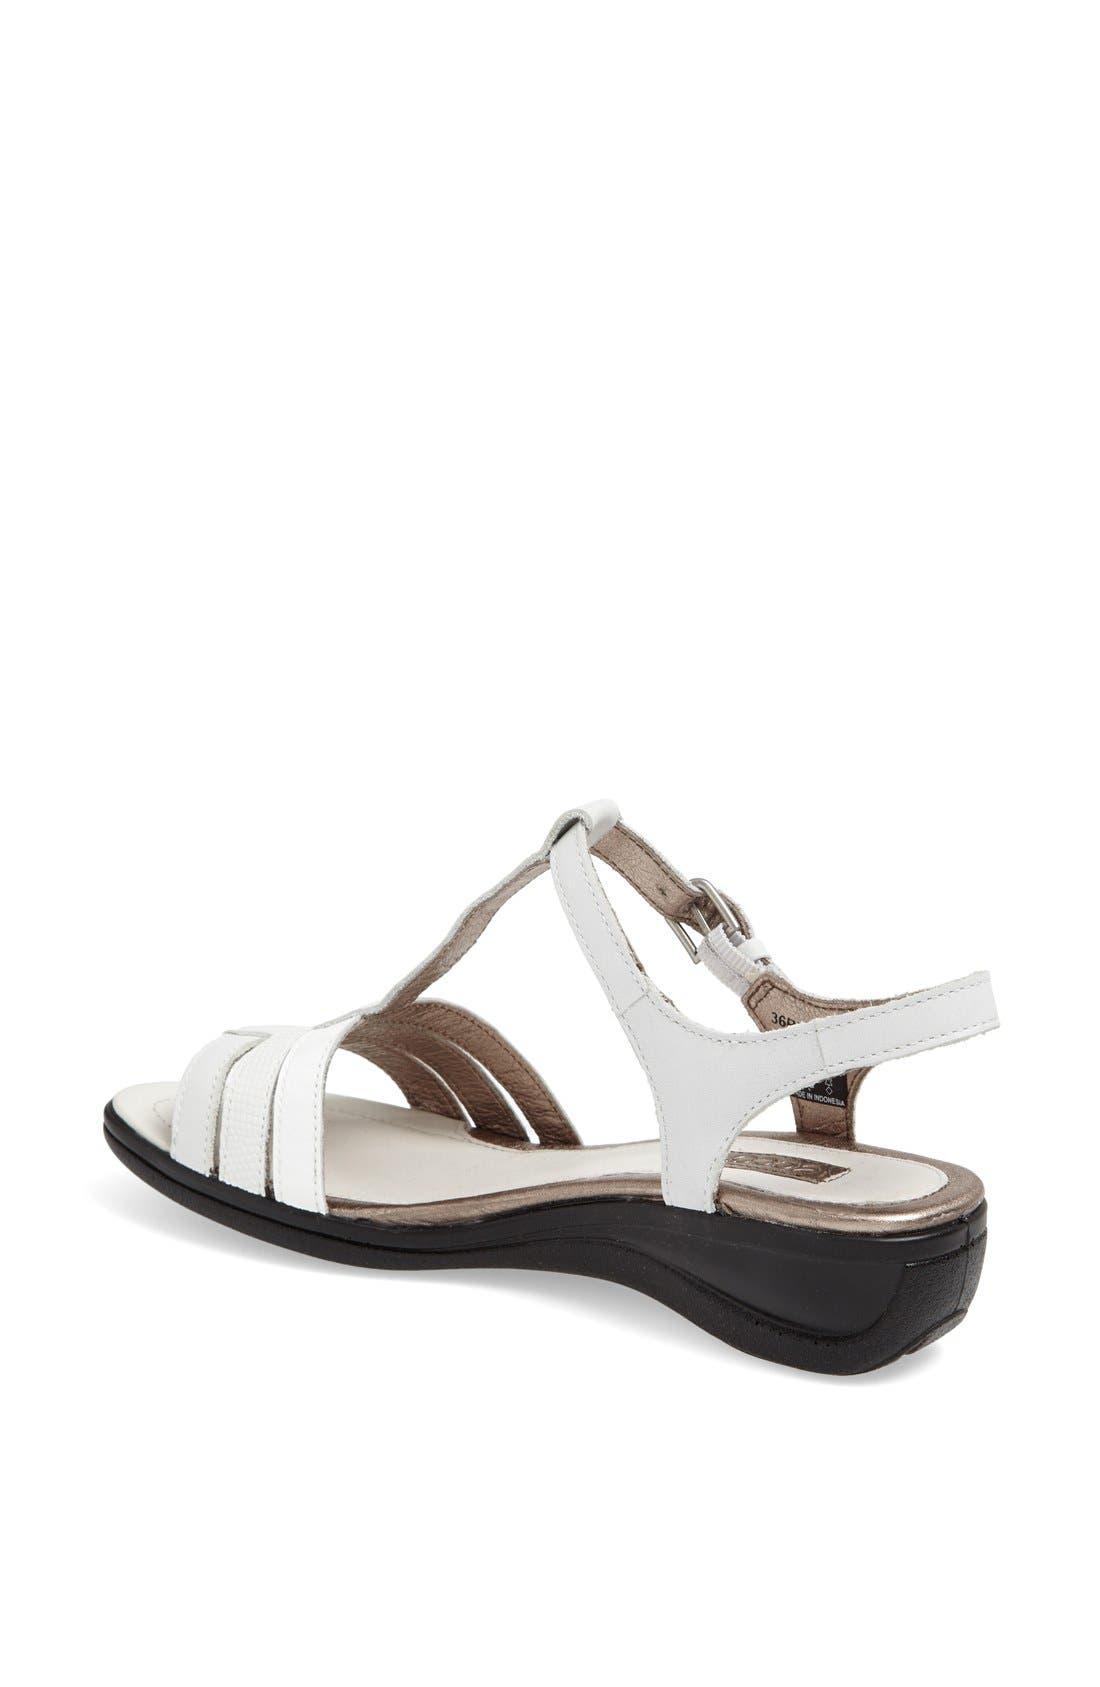 Alternate Image 2  - ECCO 'Sensata' Sandal